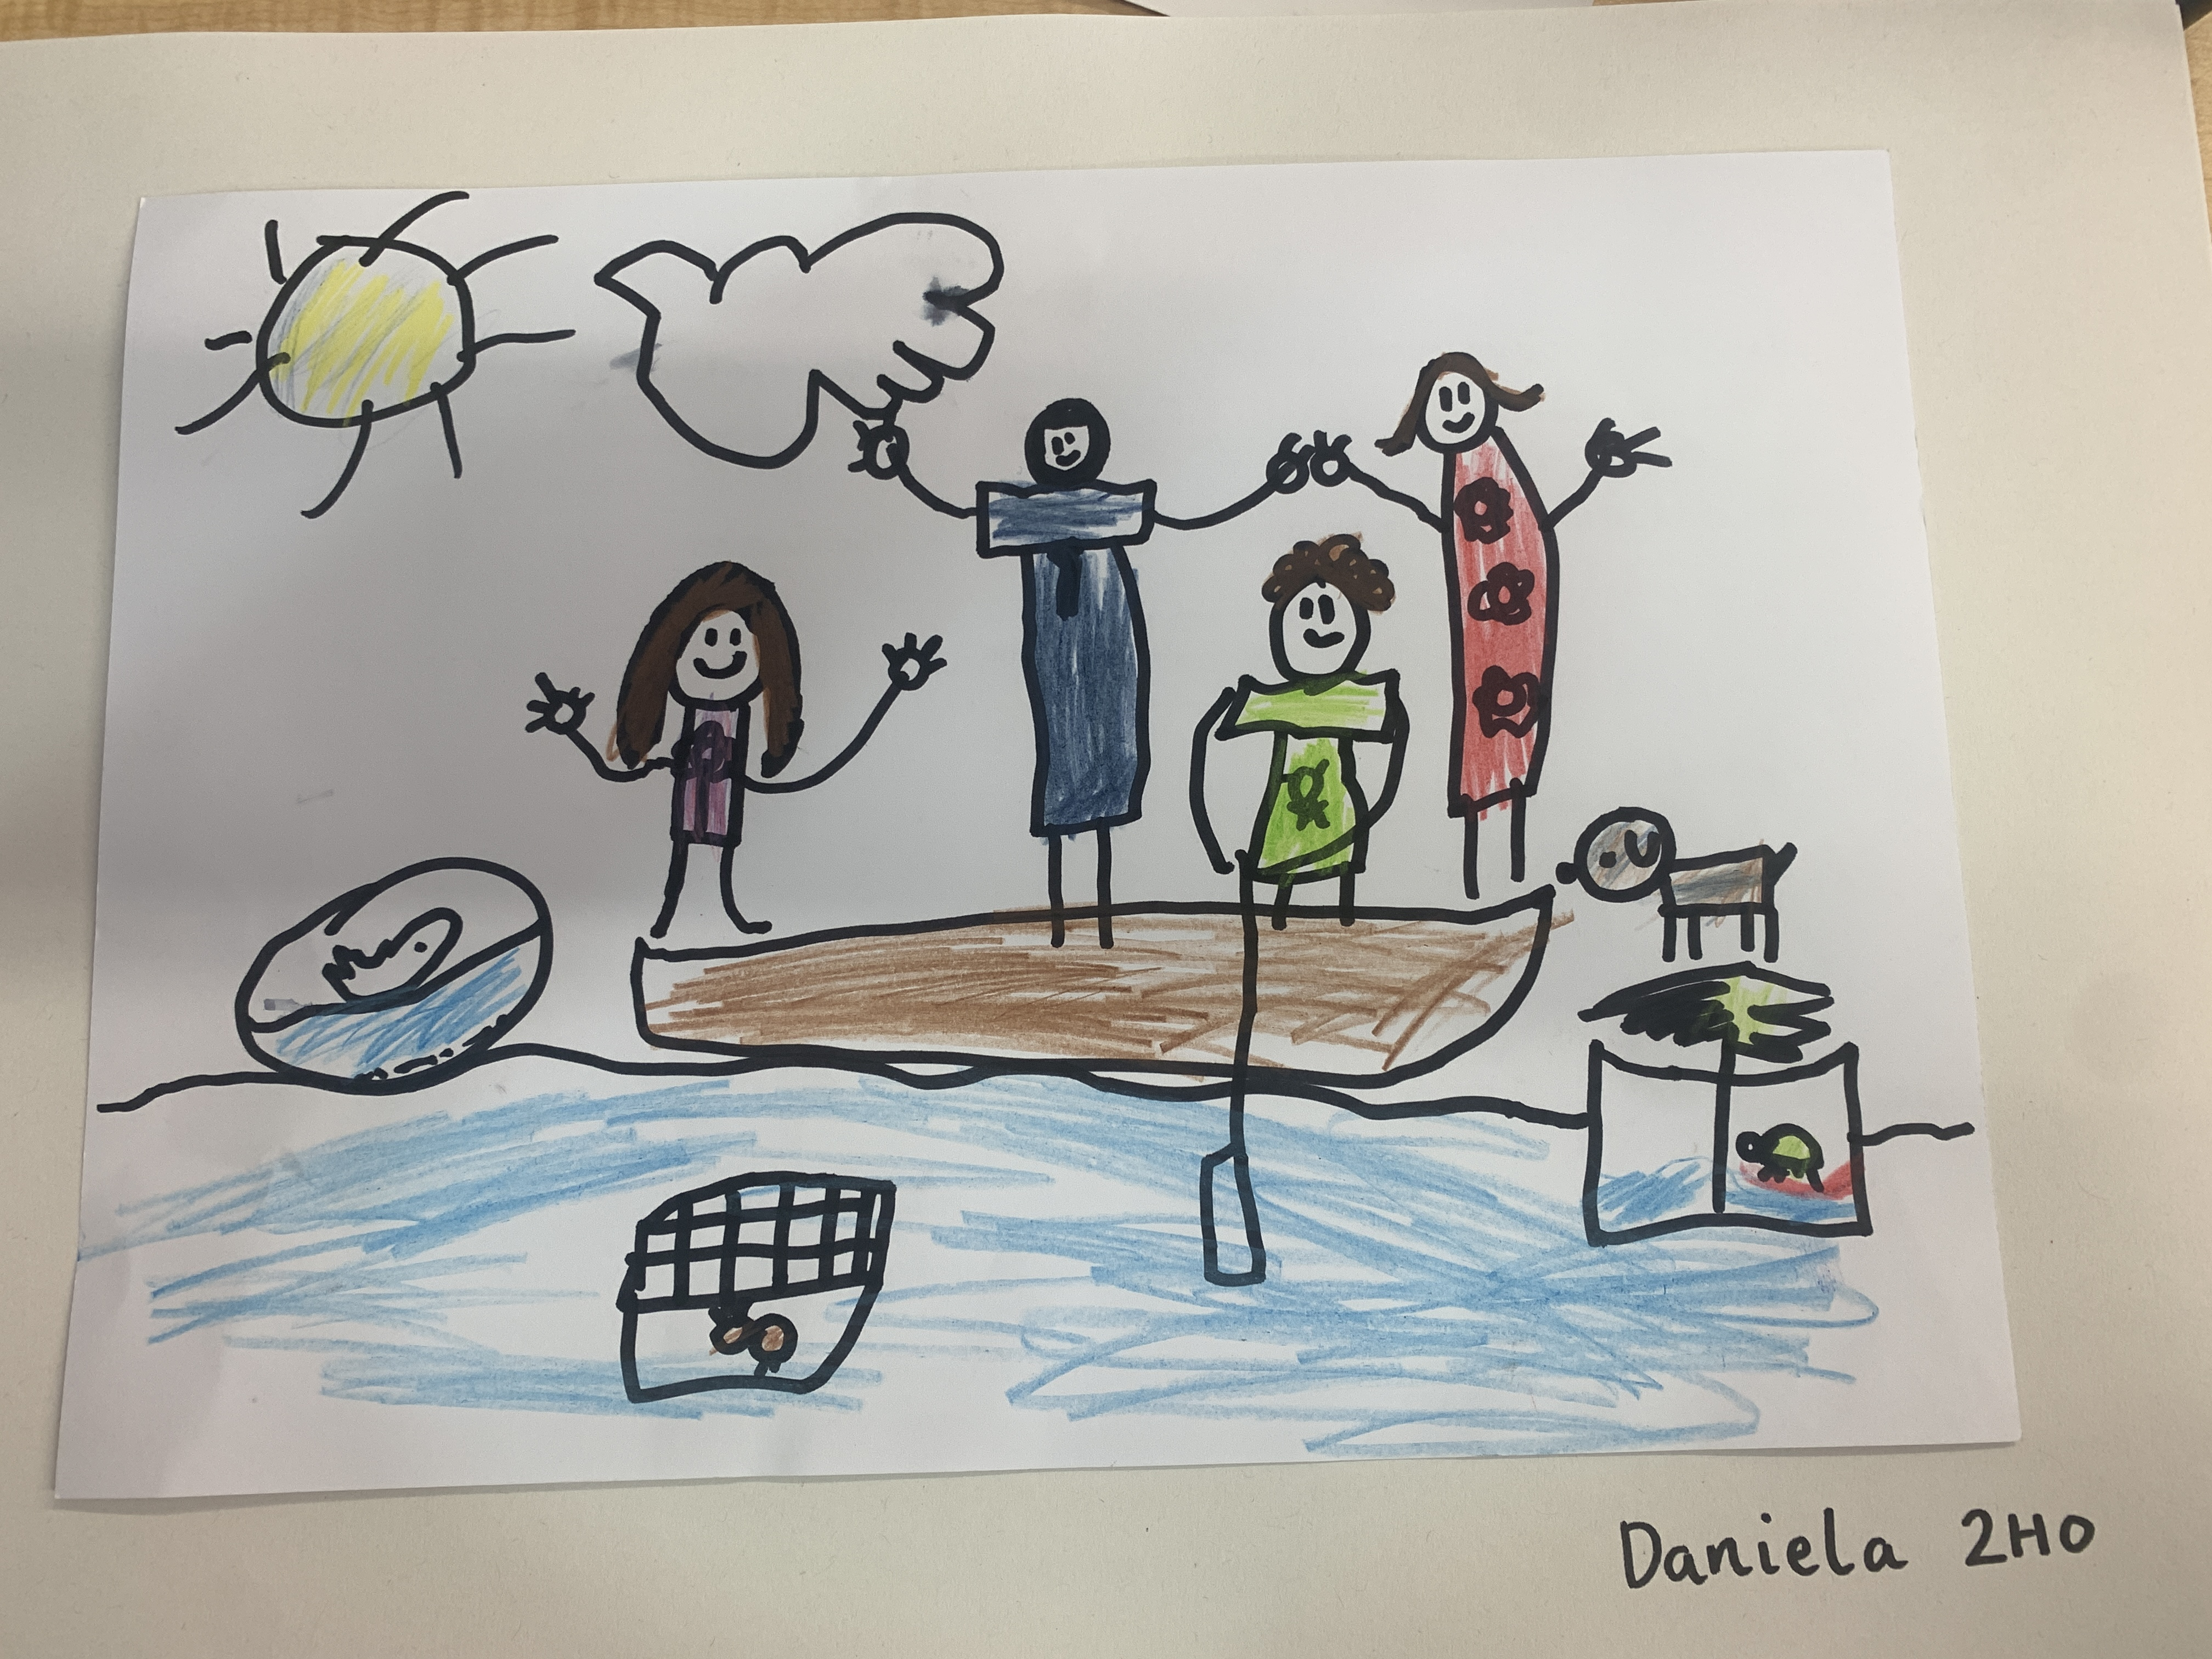 Family Sailing Trip by Daniela